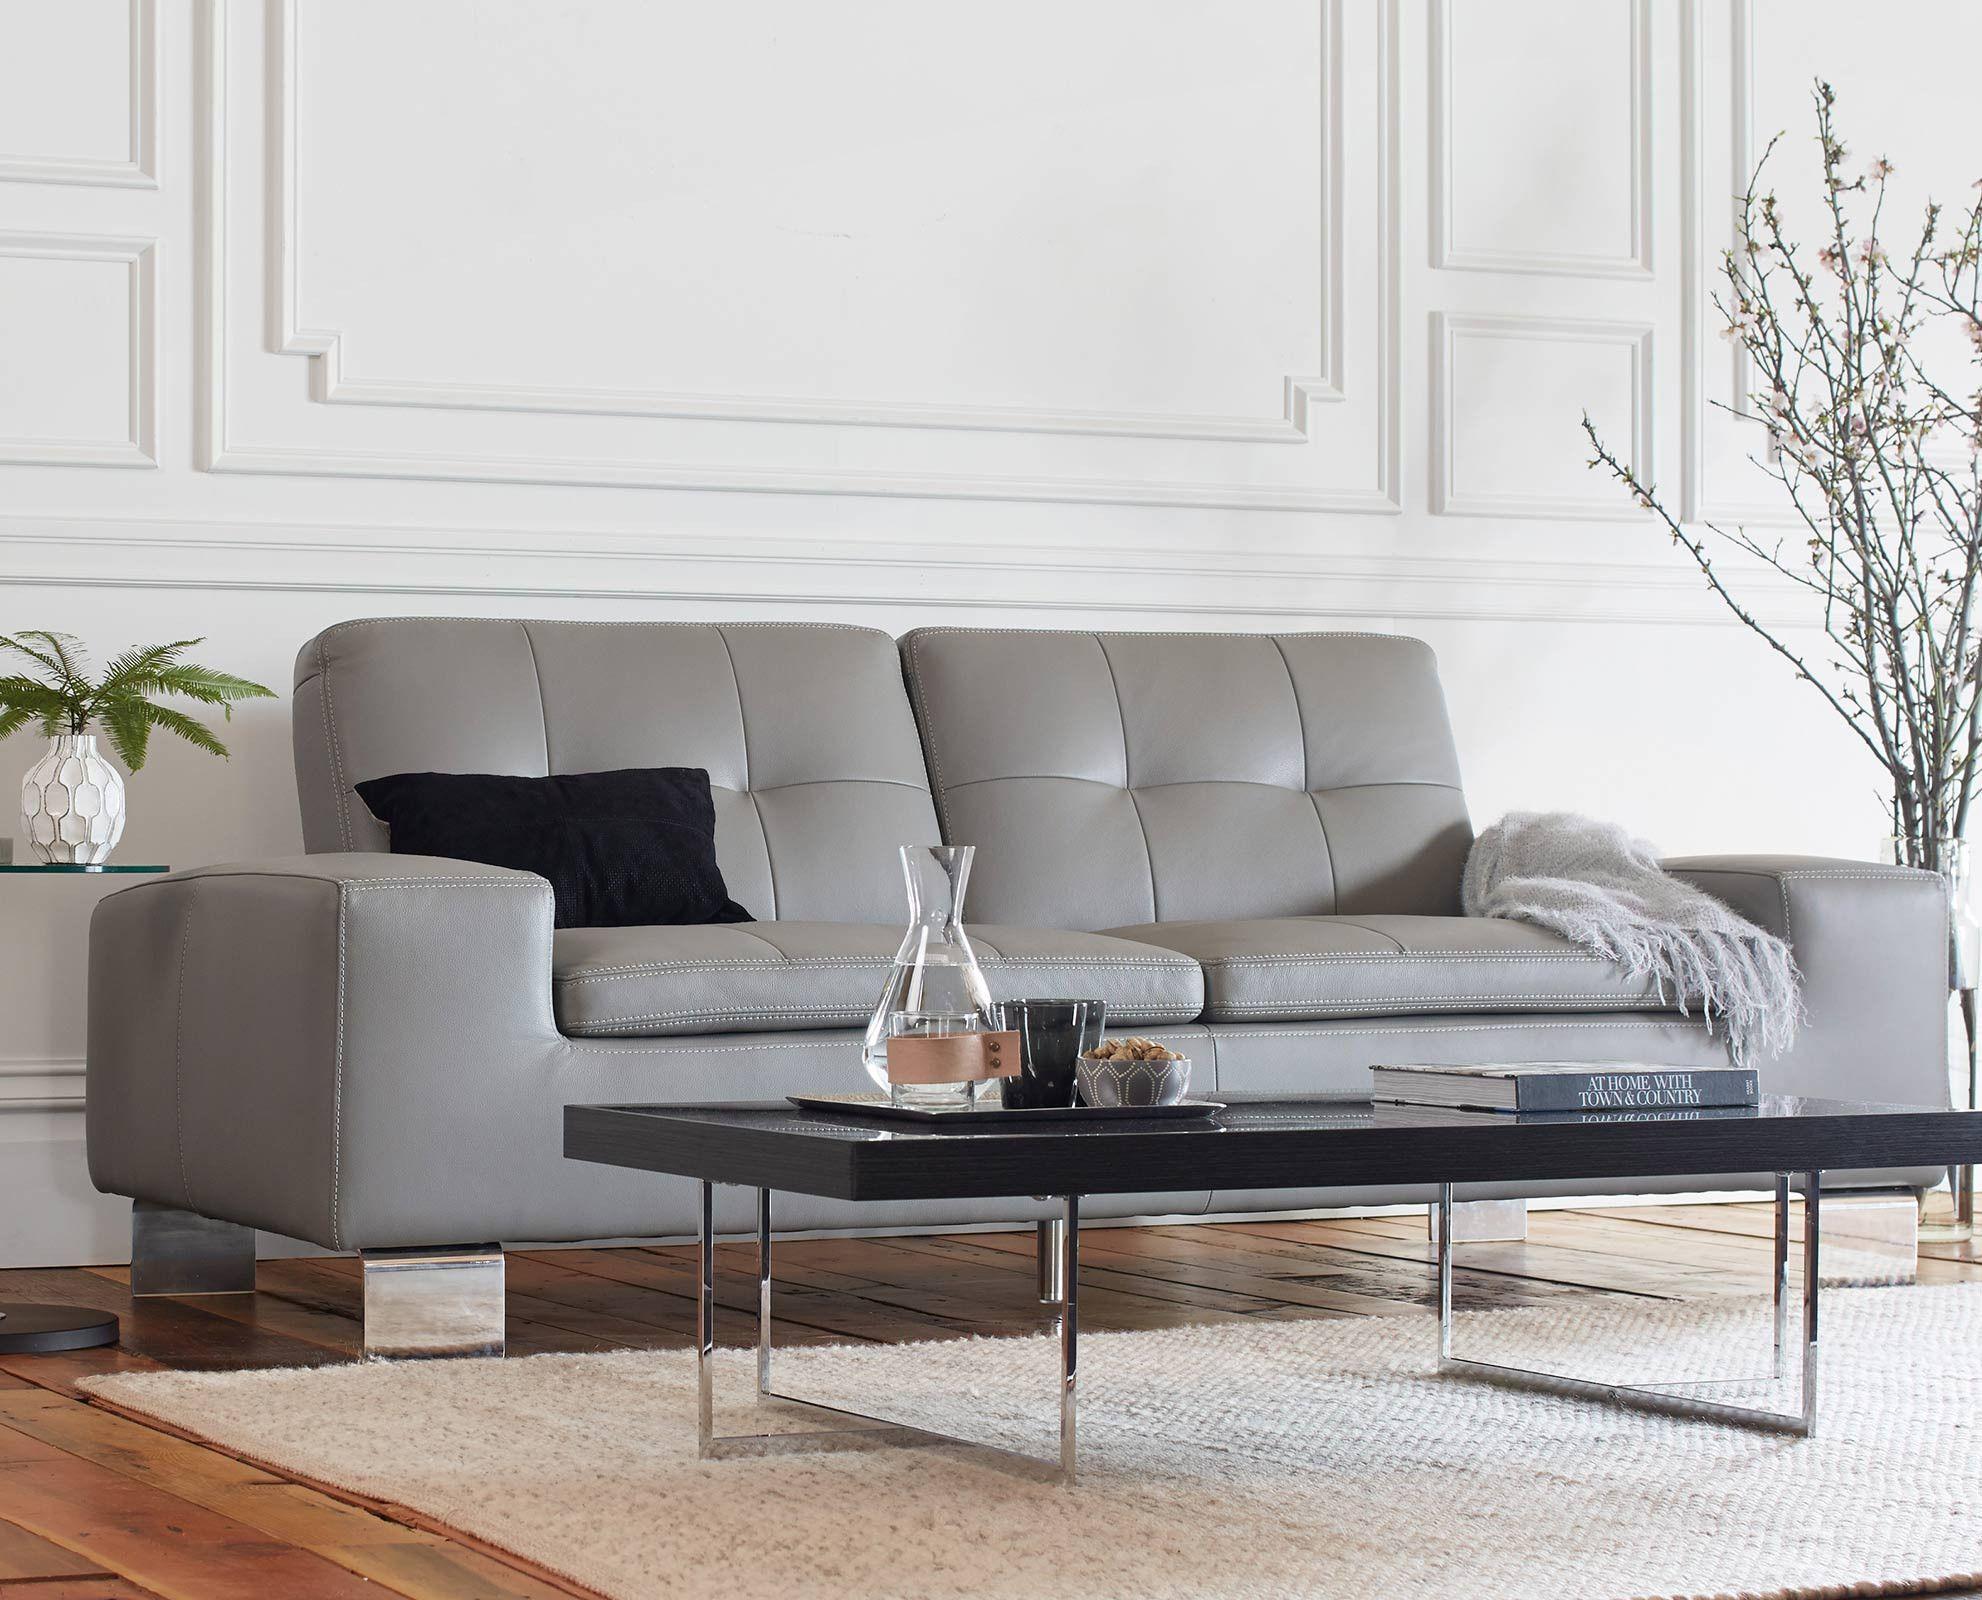 Francesca Leather Sofa Black Home Decor Furniture Best